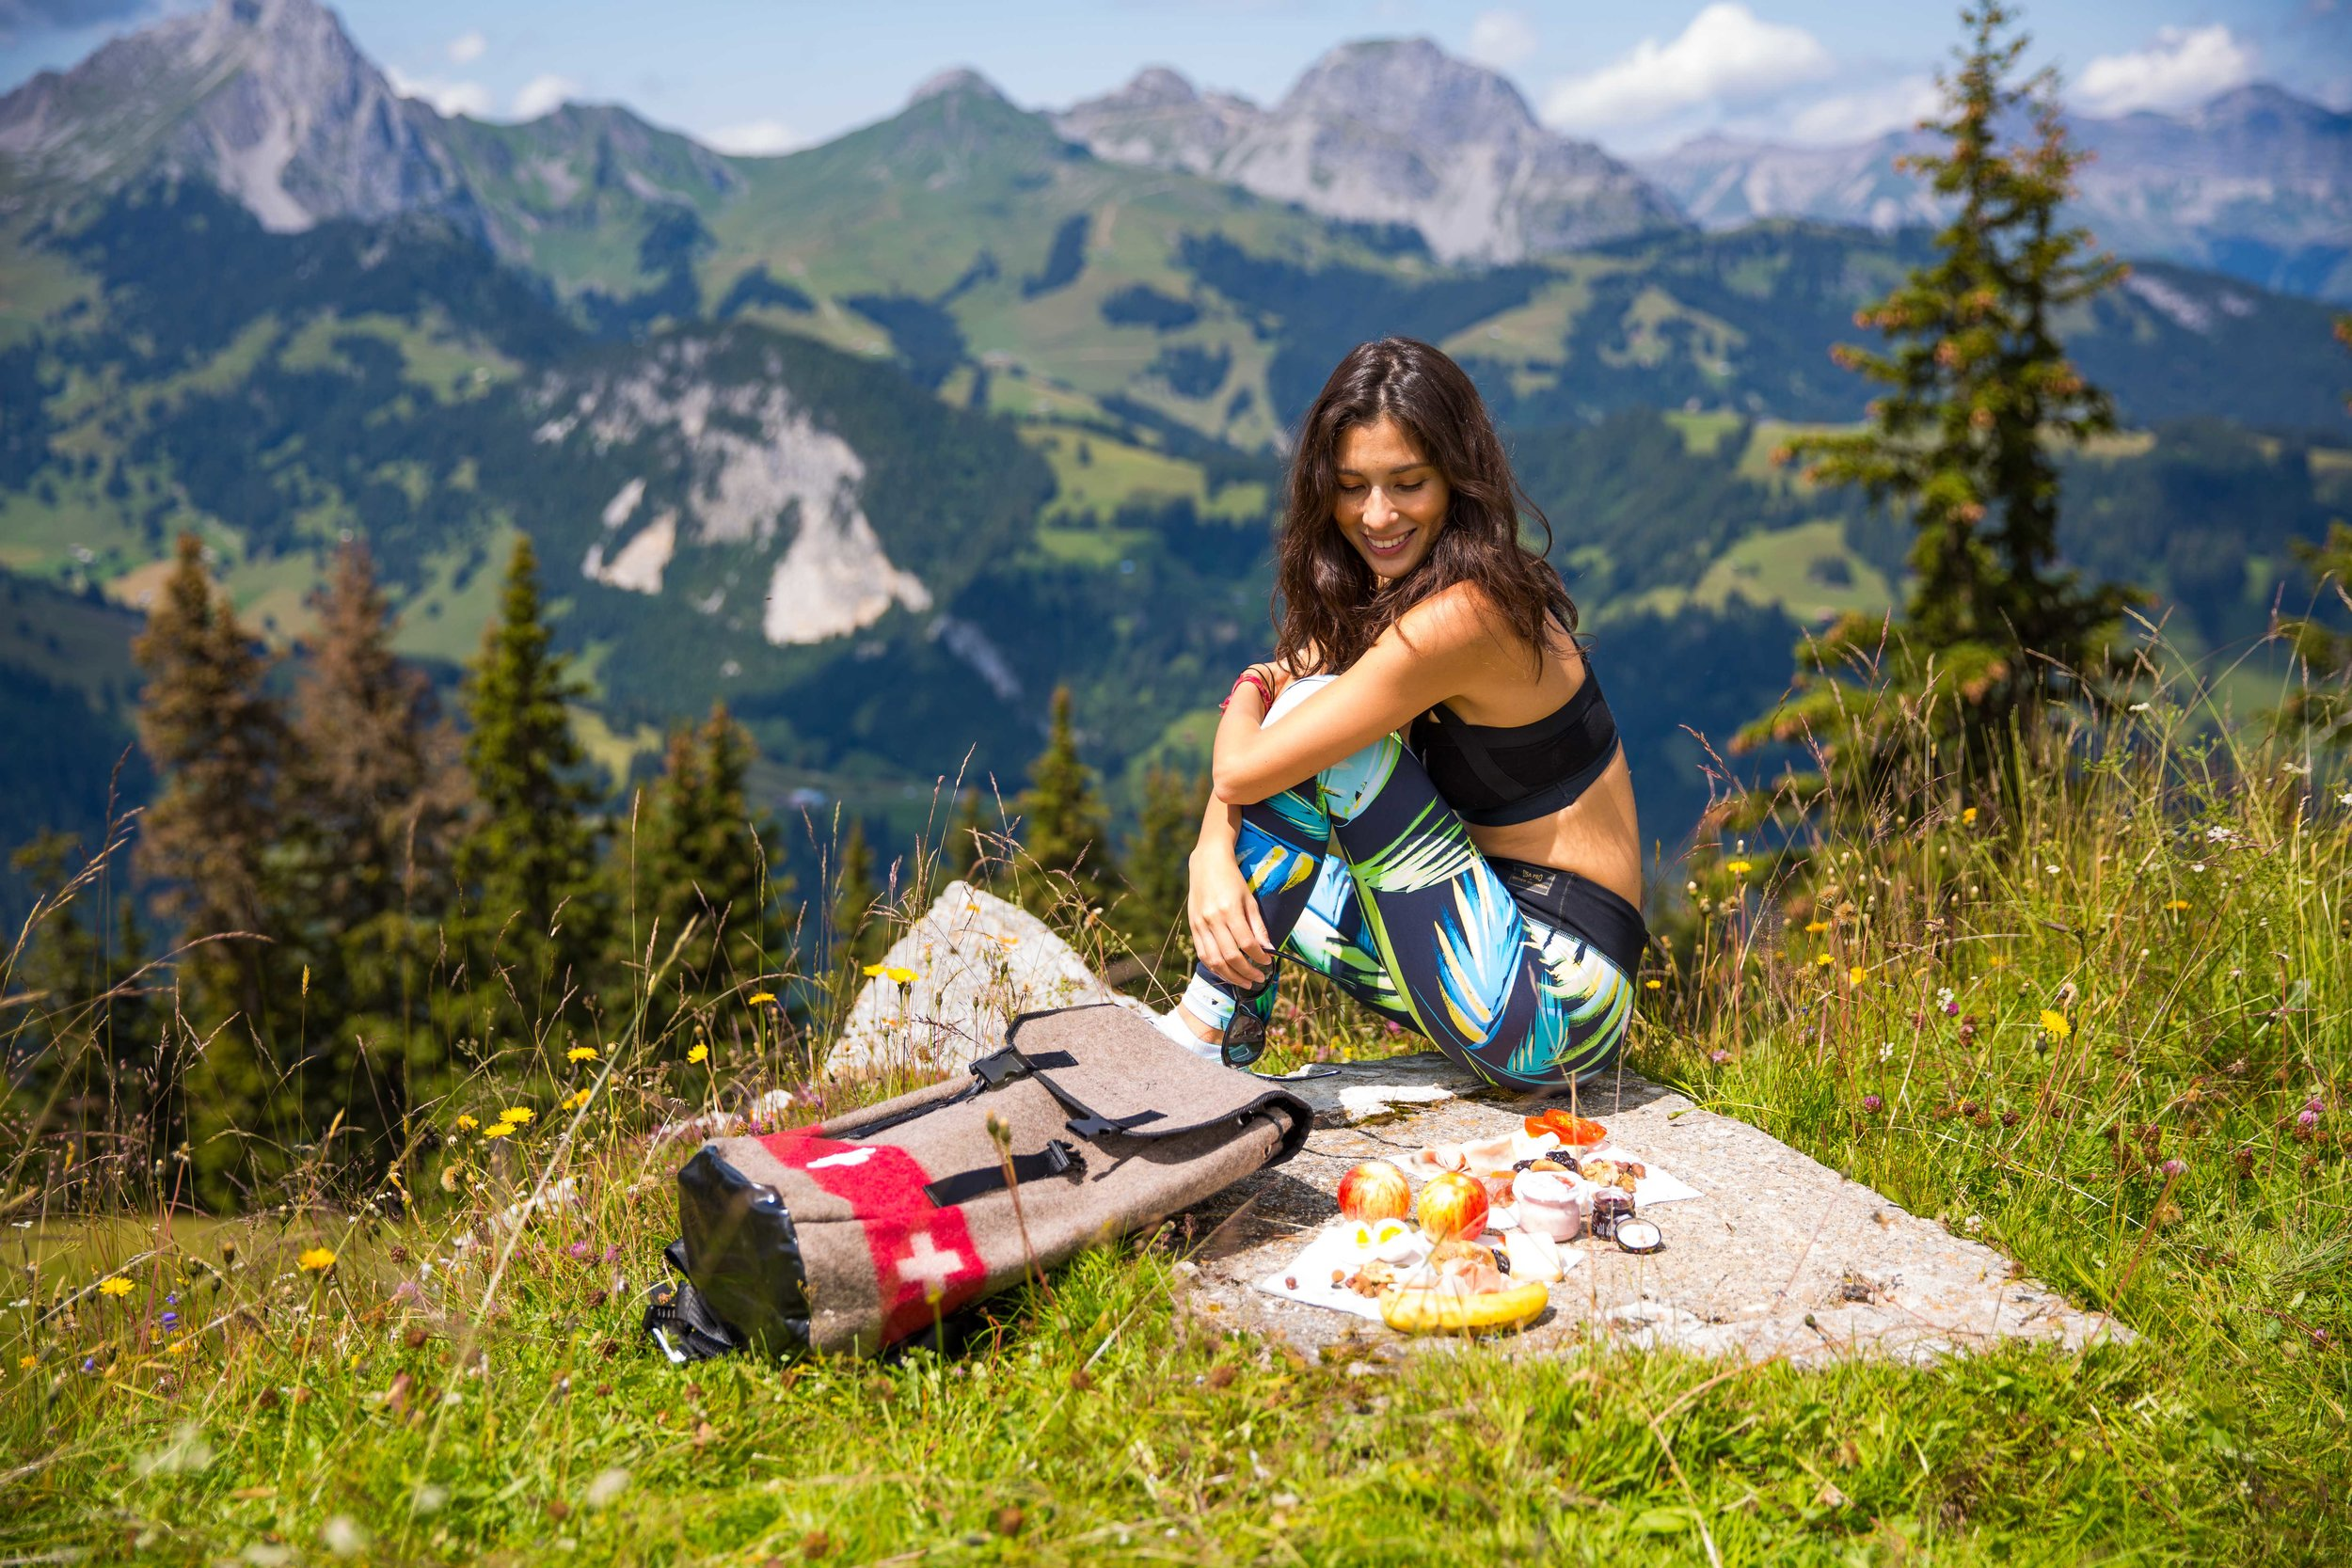 NickHopper_LeGrandBellevue_Gstaad-7260.jpg